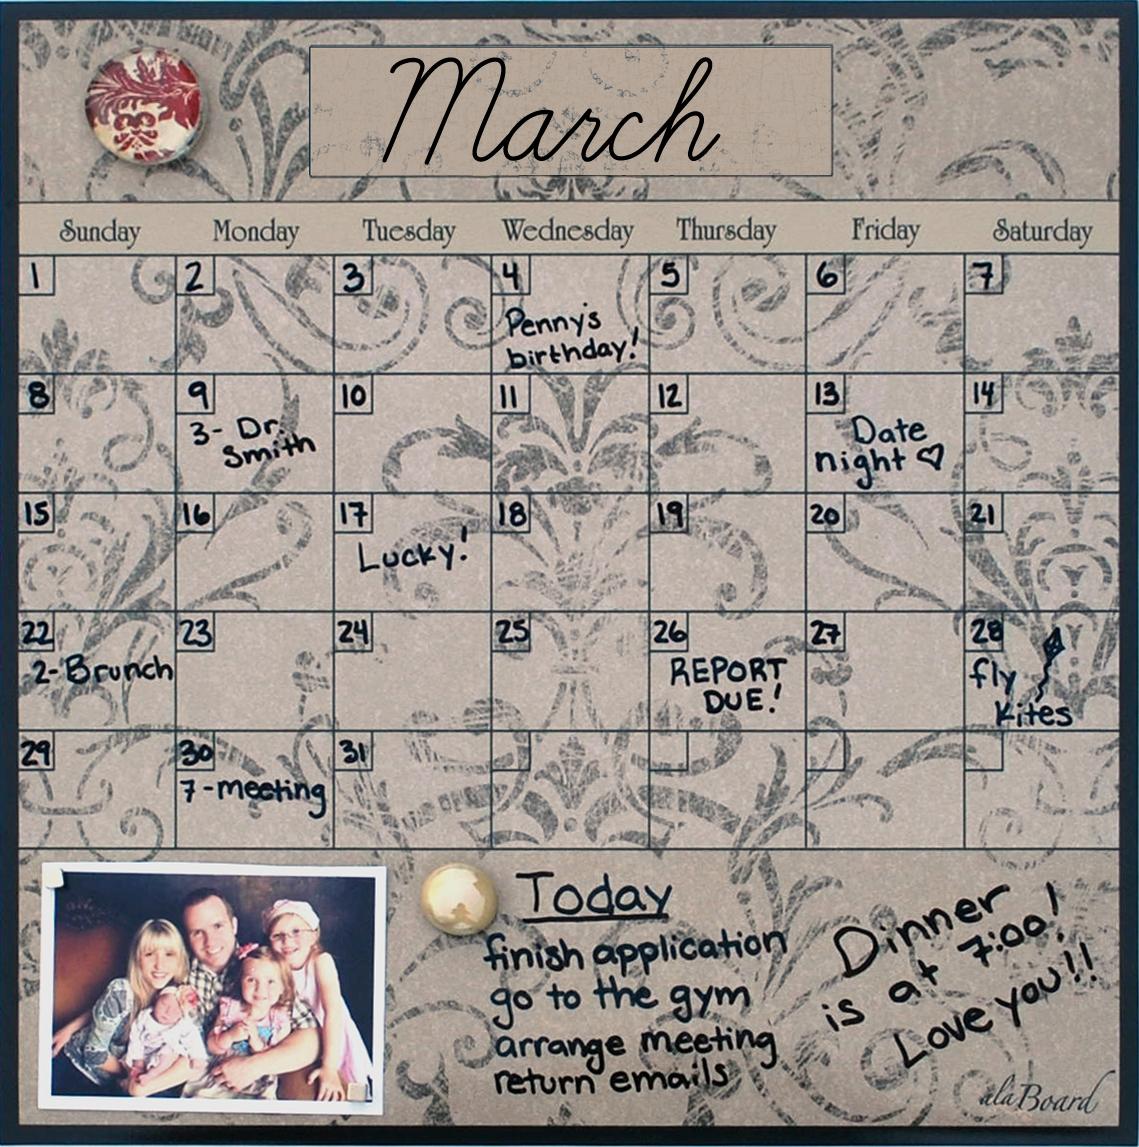 Magnetic Monthly Calendar For Refrigerator : Custom design fridge magnet calendar custom design fridge magnet